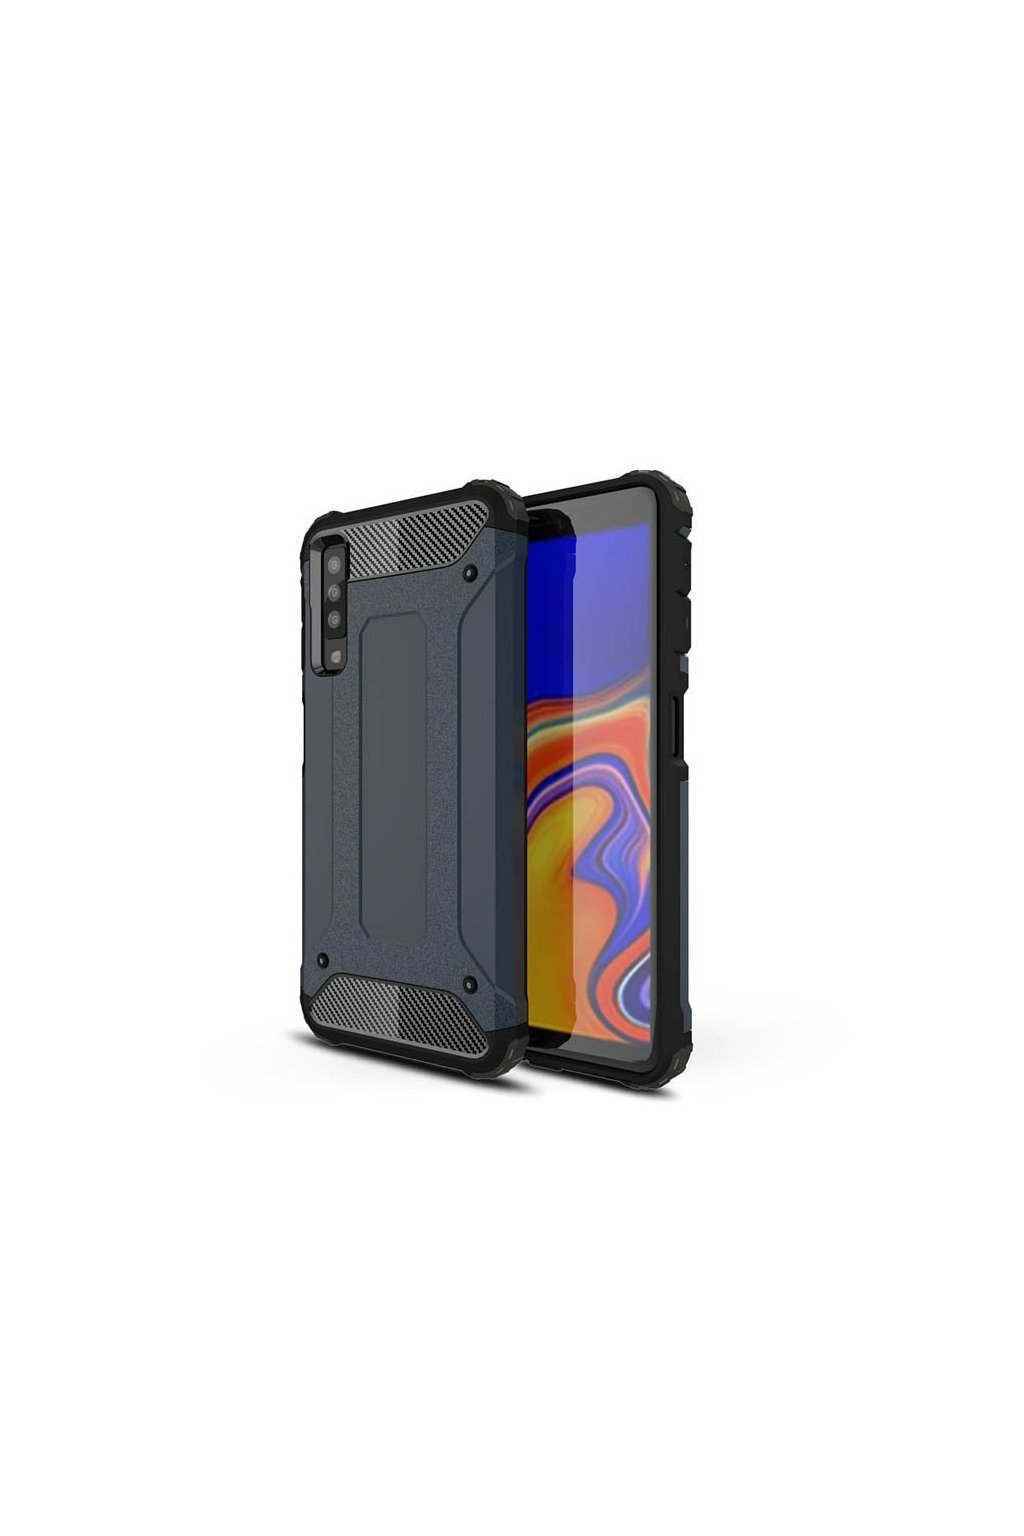 eng pl Hybrid Armor Case Tough Rugged Cover for Samsung Galaxy A7 2018 A750 blue 45728 1